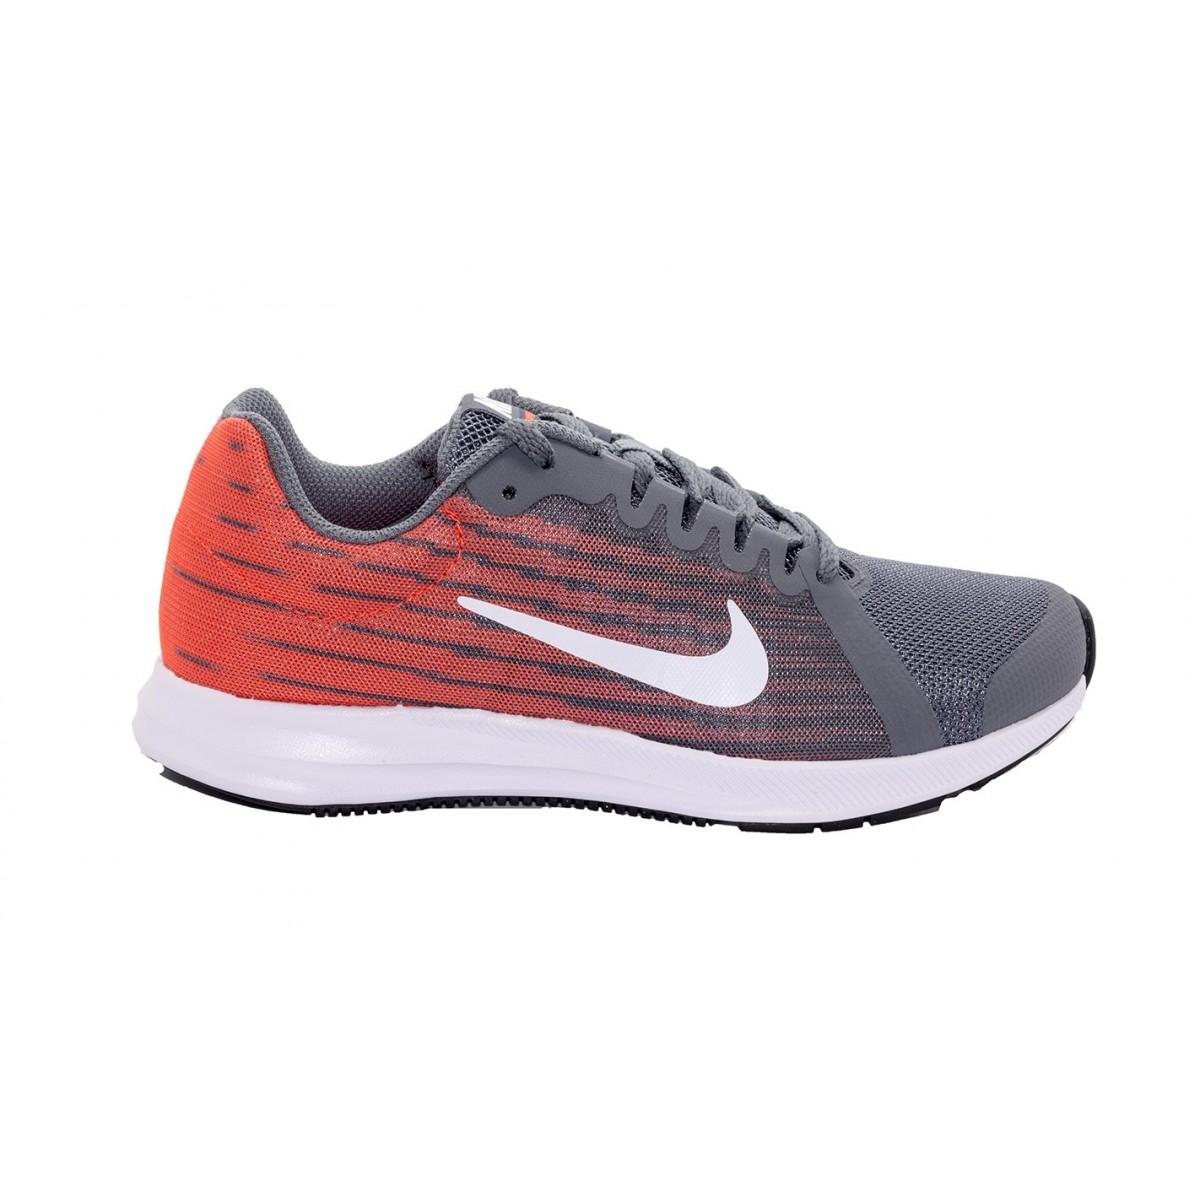 Tienda de descuento para En venta Finishline Nike downshifter 8 zapatillas running mujer 922853 003 grises i4BUt